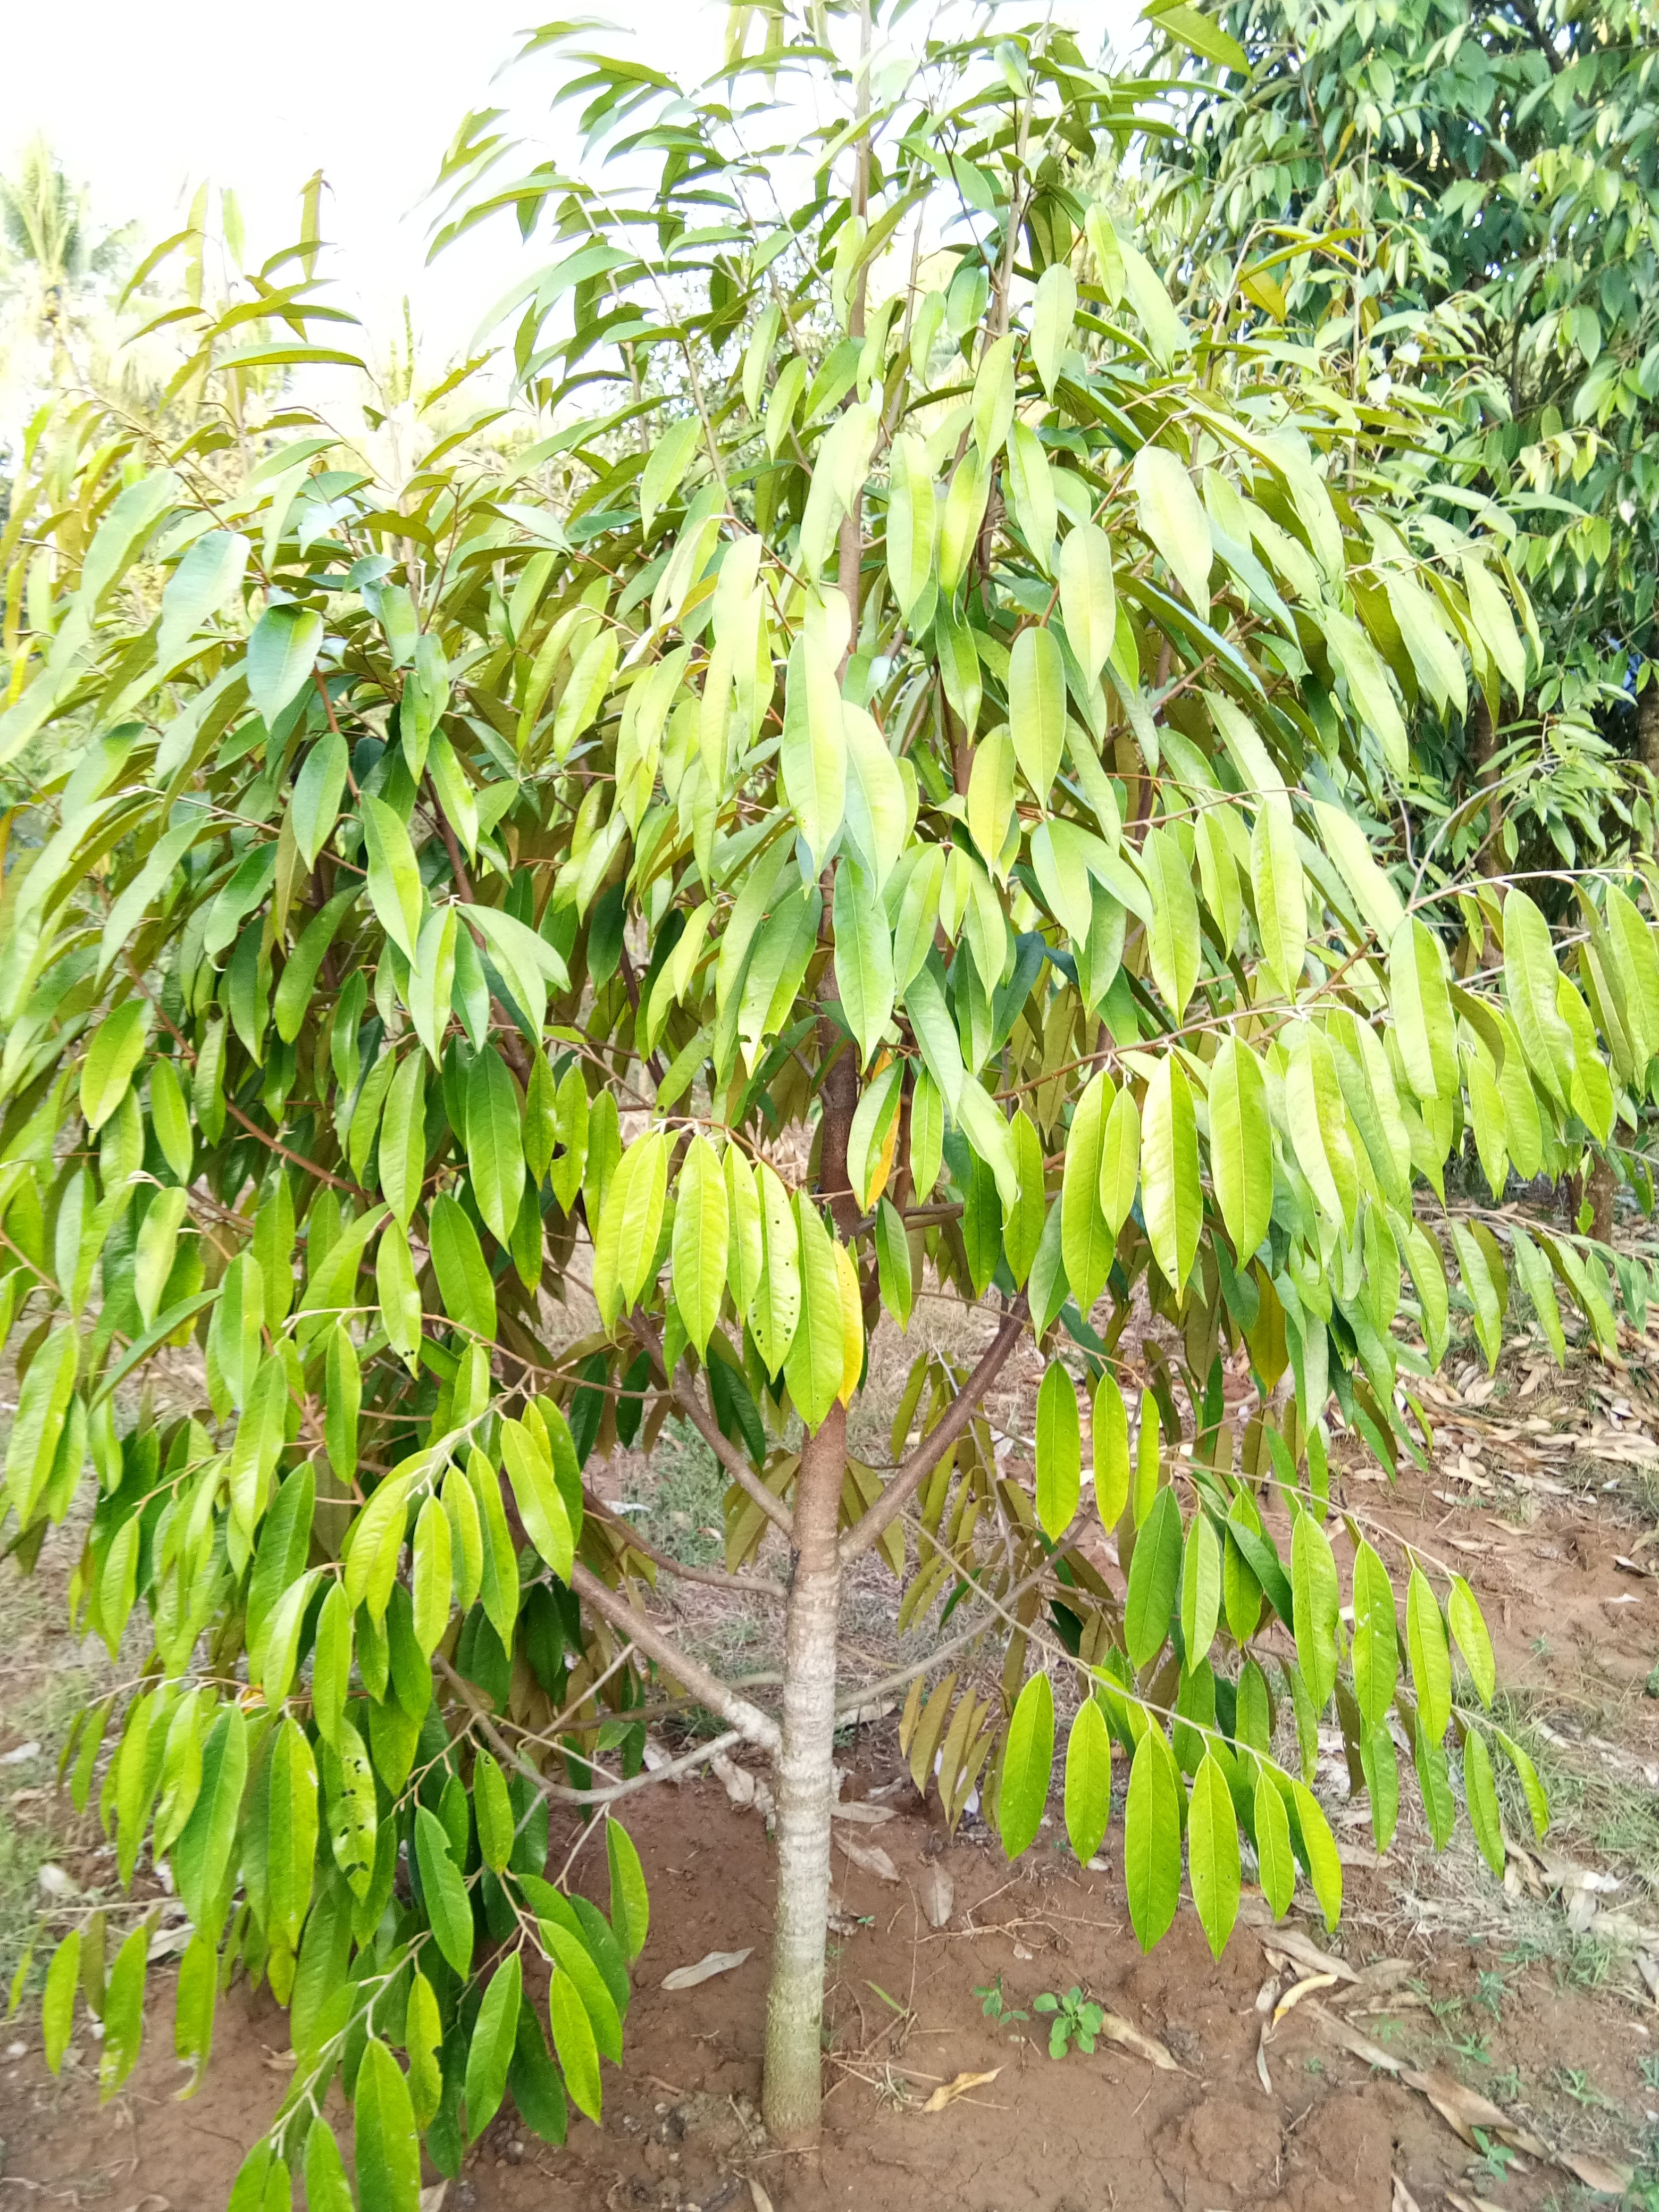 Hp Wa 0822 2022 8118 Durian Merah Bibit Durian Musang King Dongkelan Durian Plants Flowers